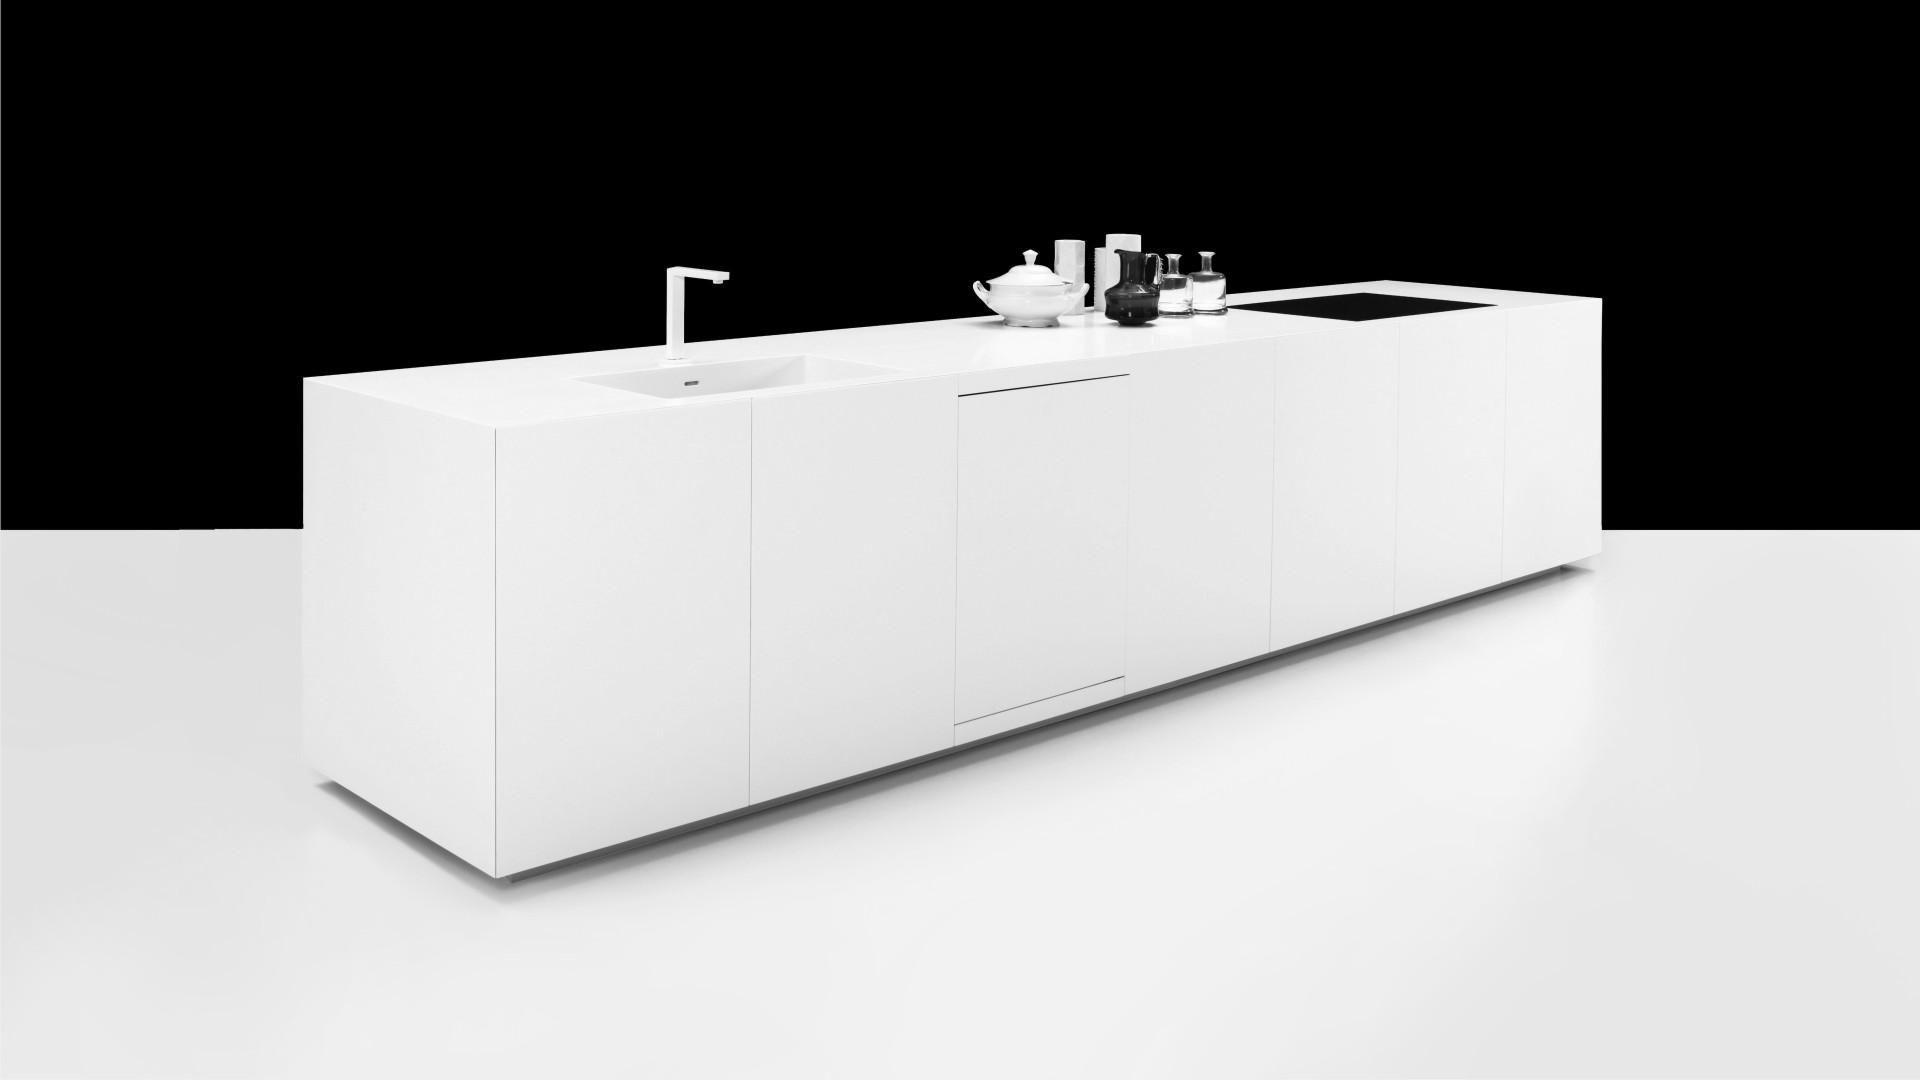 Design Cube Keuken : Pin by jonas zelvys on modern interior design